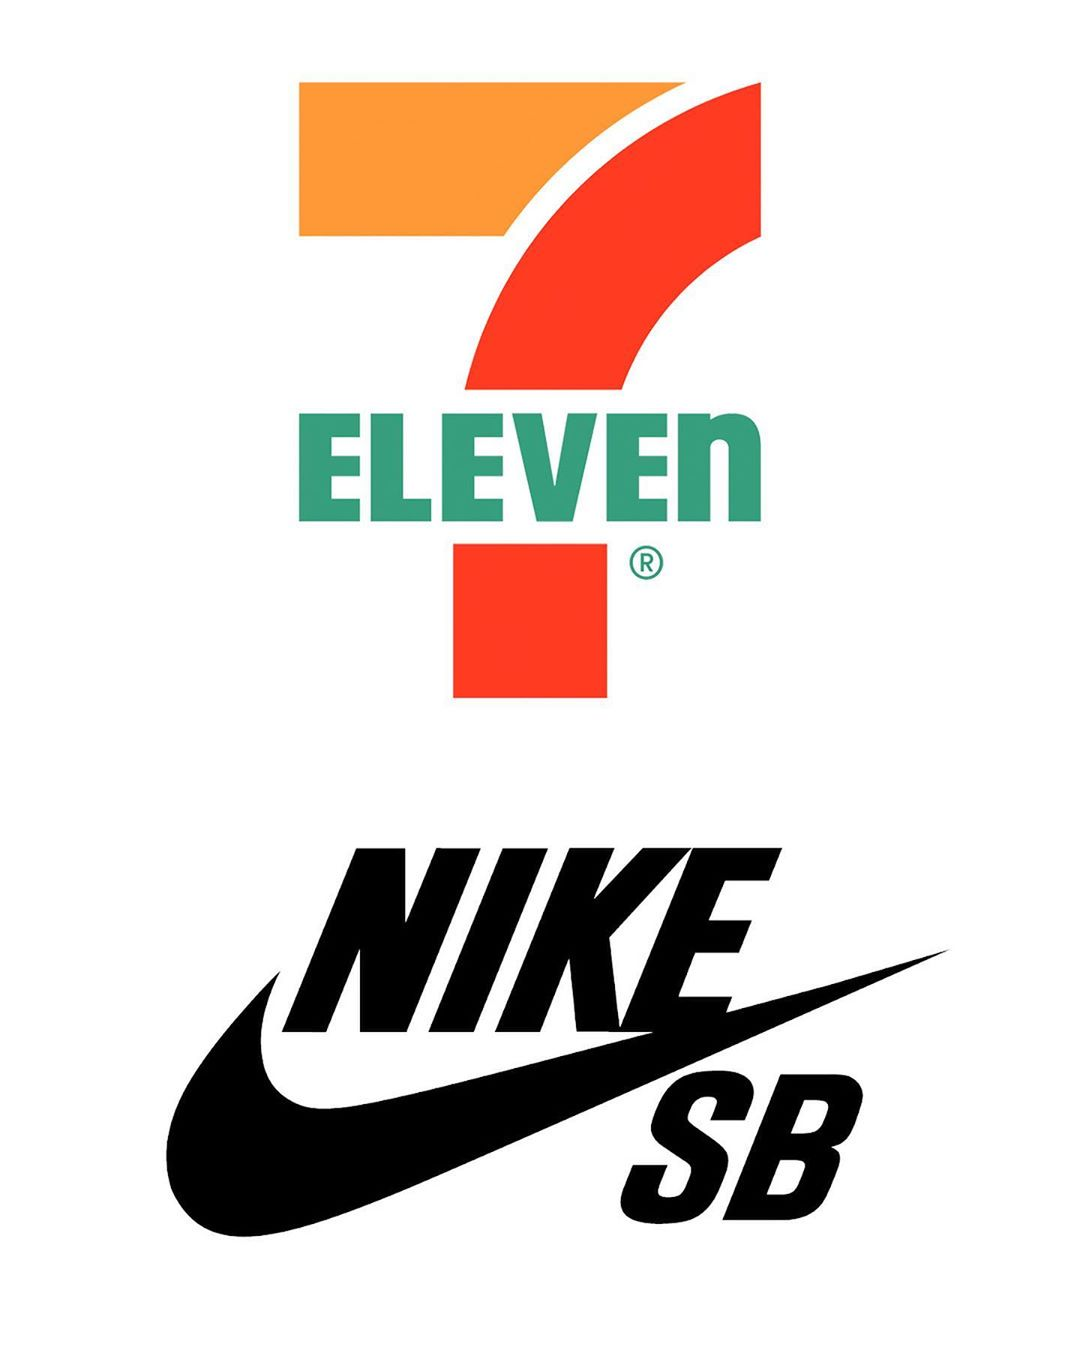 7-eleven-nike-sb-dunk-low-release-2020